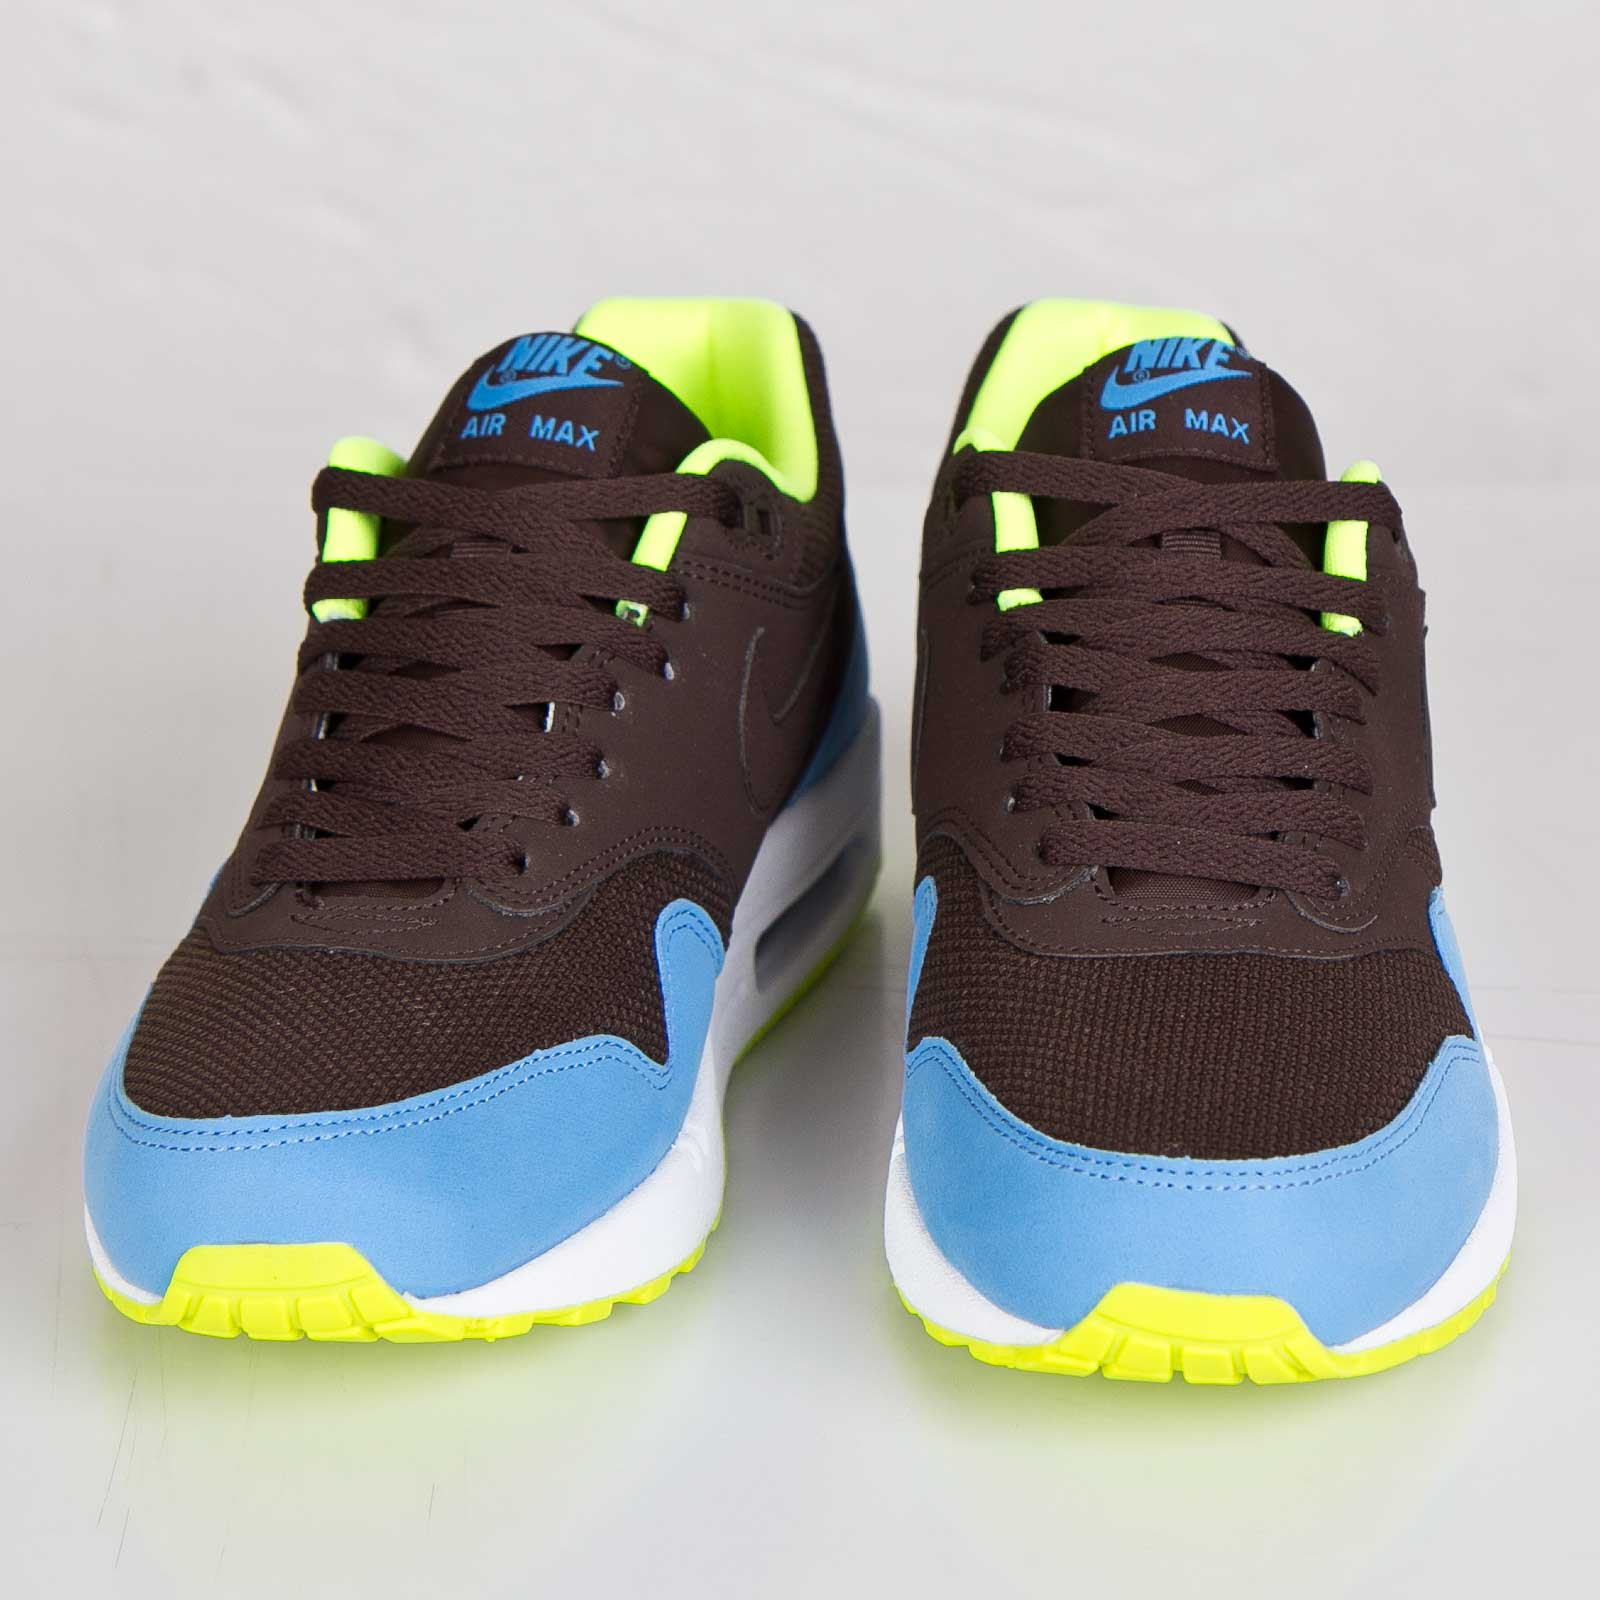 f0e7ef95b4e3 Nike Air Max 1 Essential - 537383-201 - Sneakersnstuff